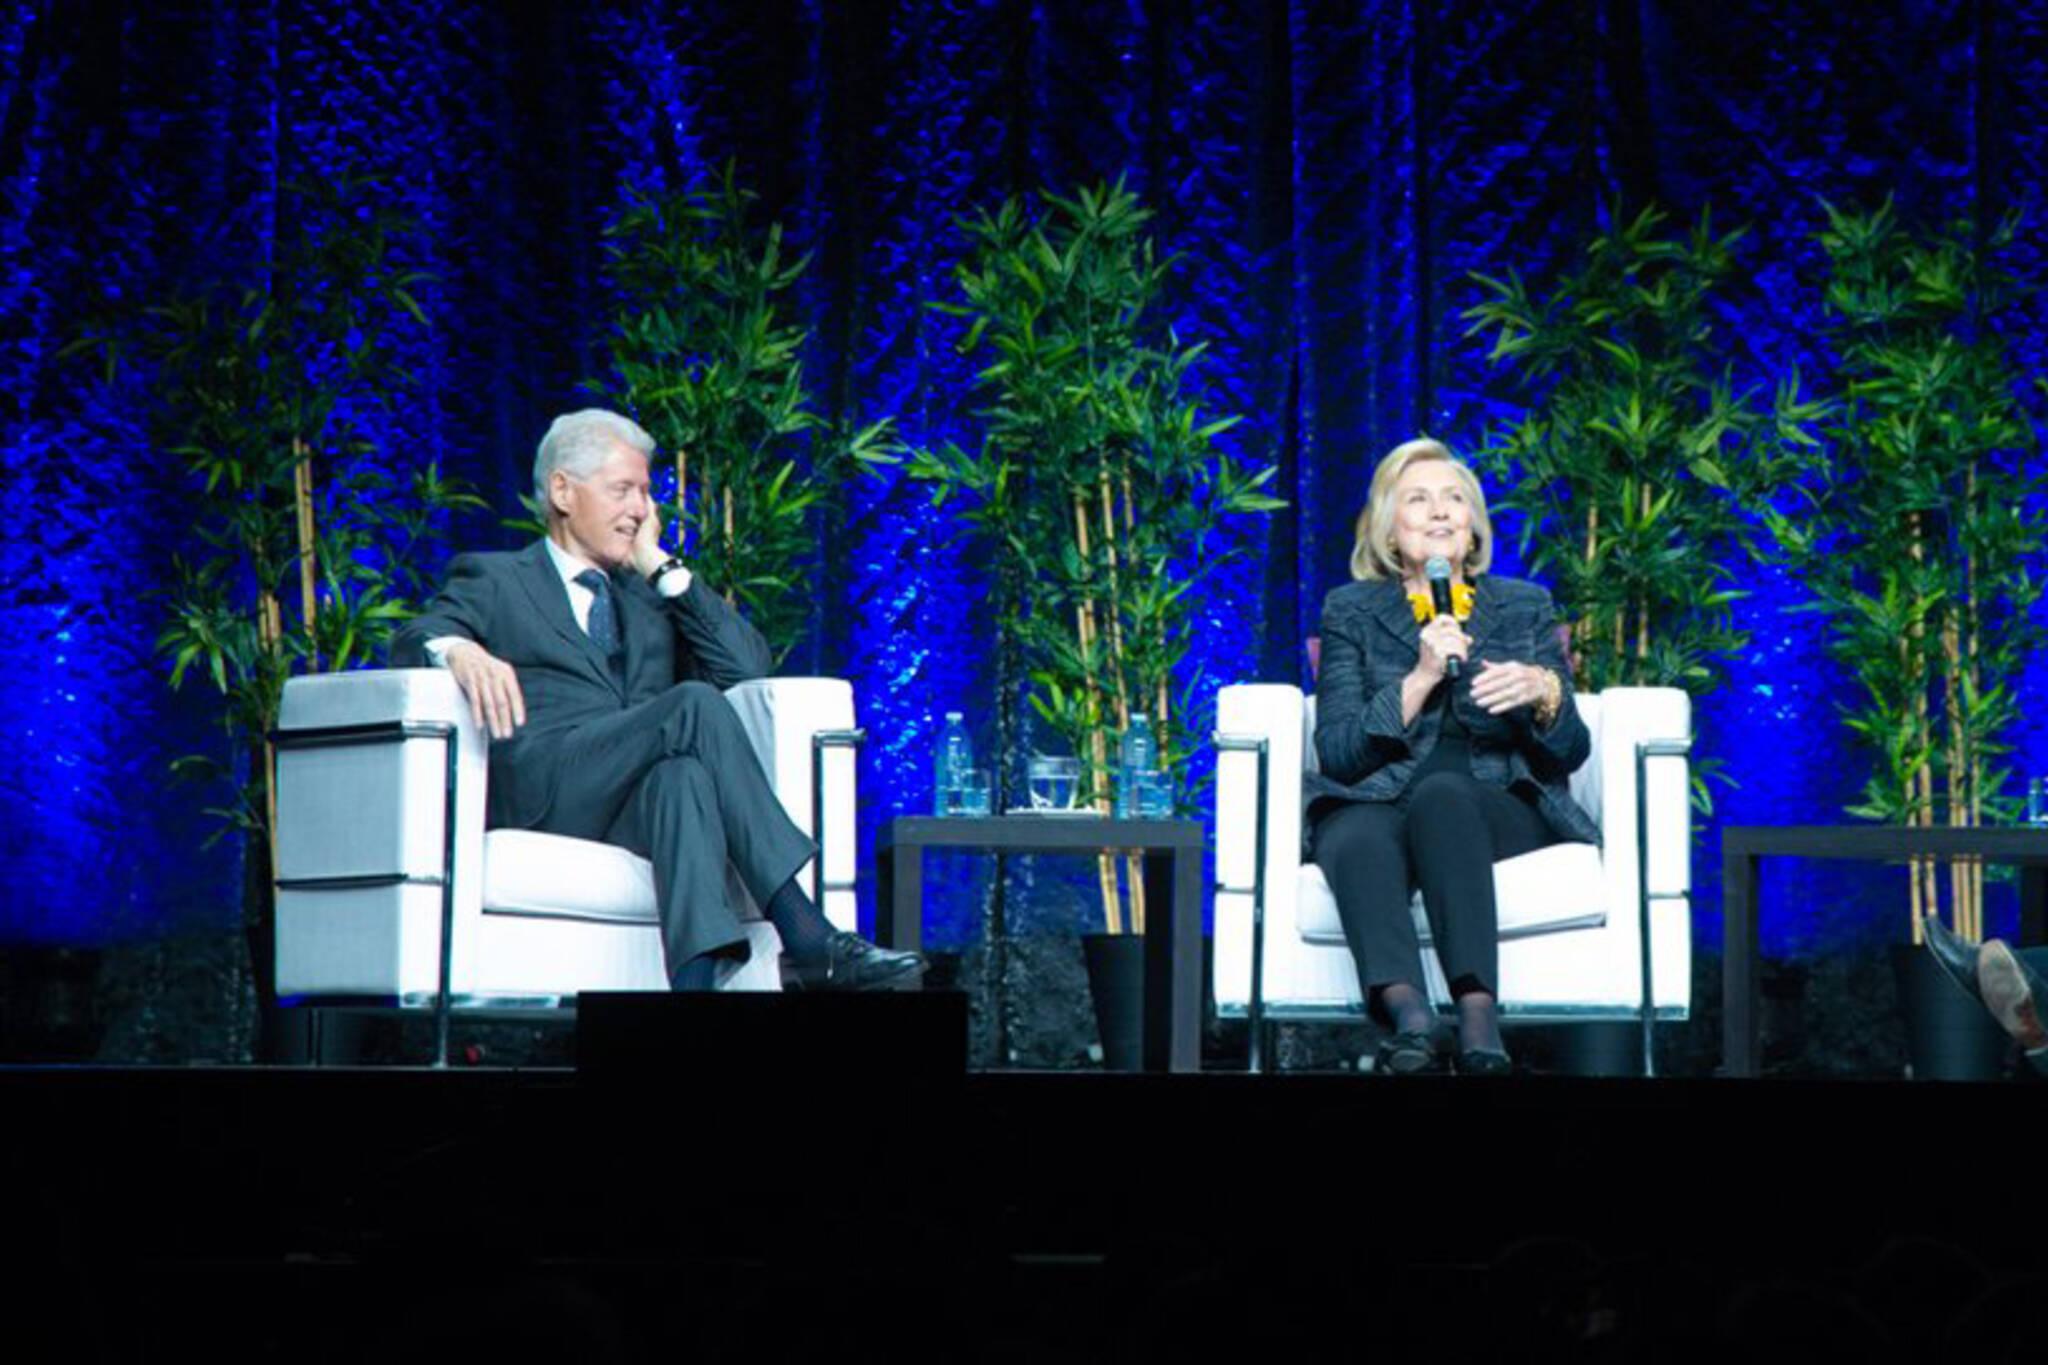 Bill Hillary Clinton Toronto